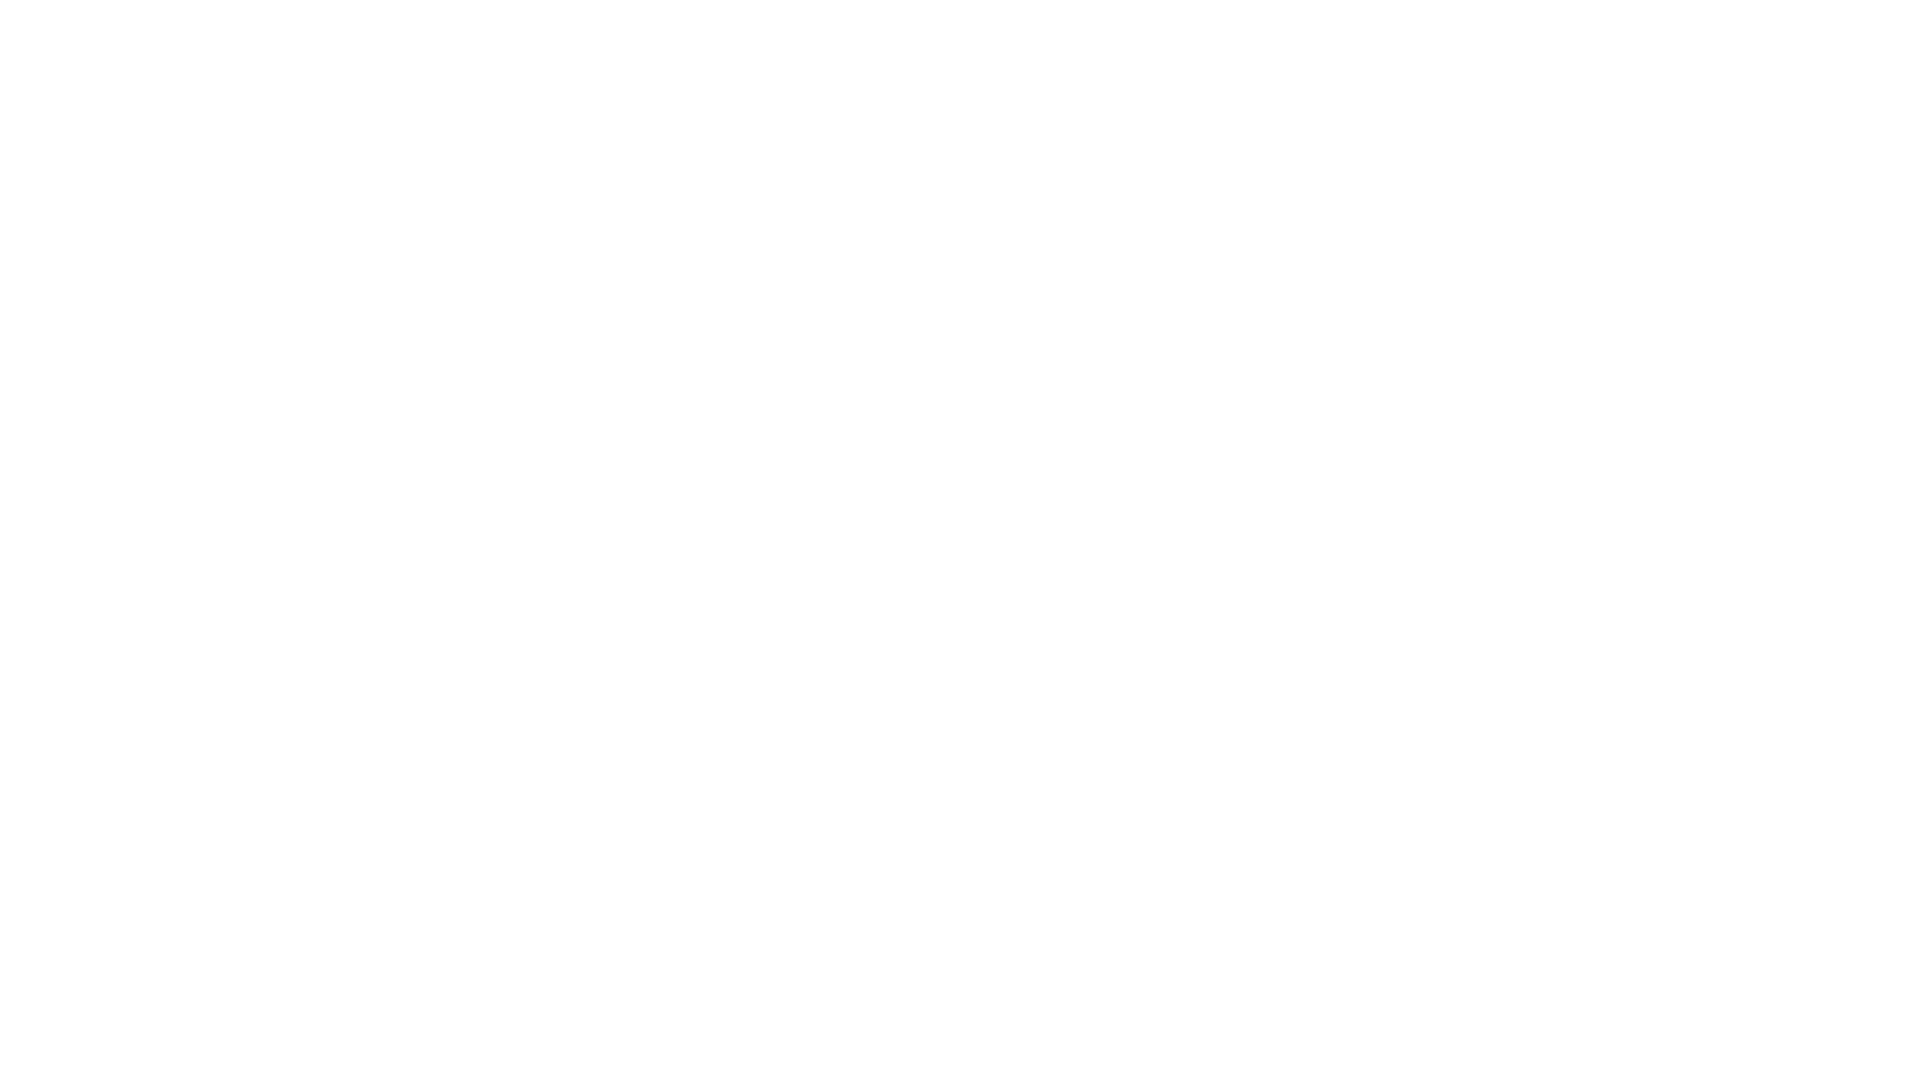 MyPilotApps